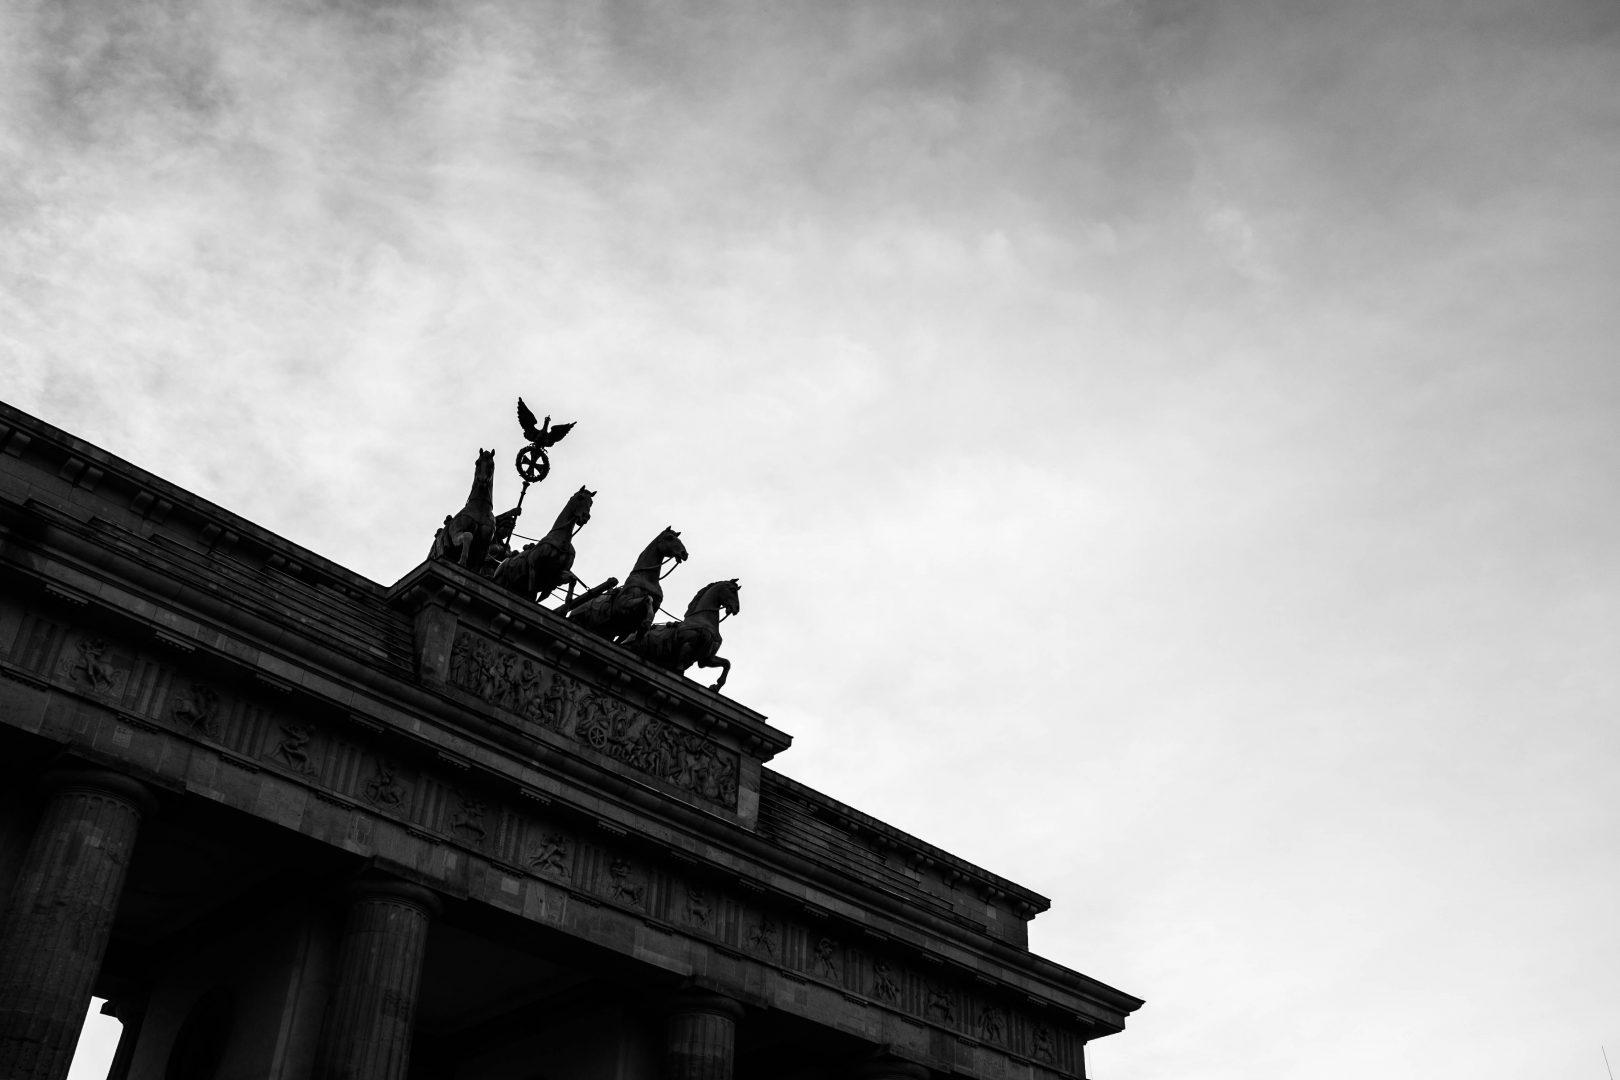 Berlin, 2019 © Gabriela Souza